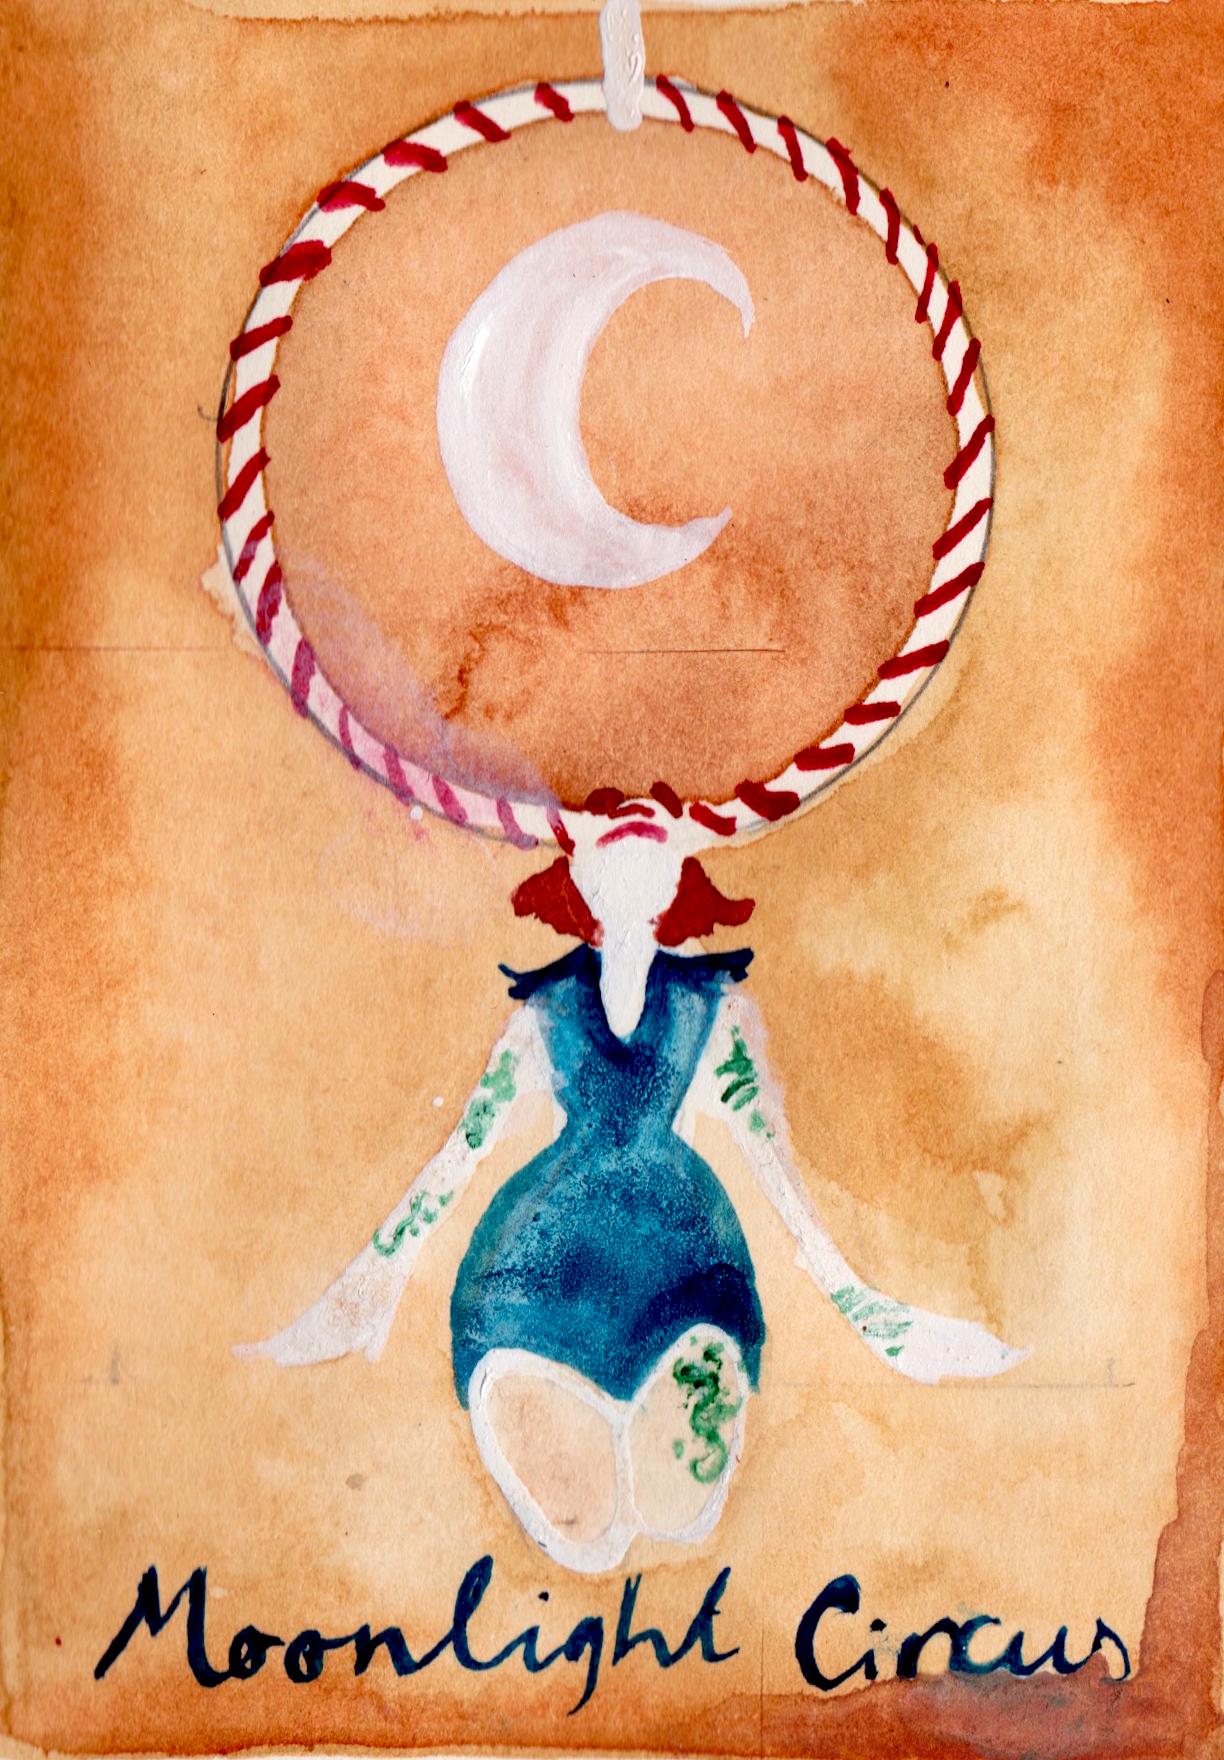 Moonlight Circus poster